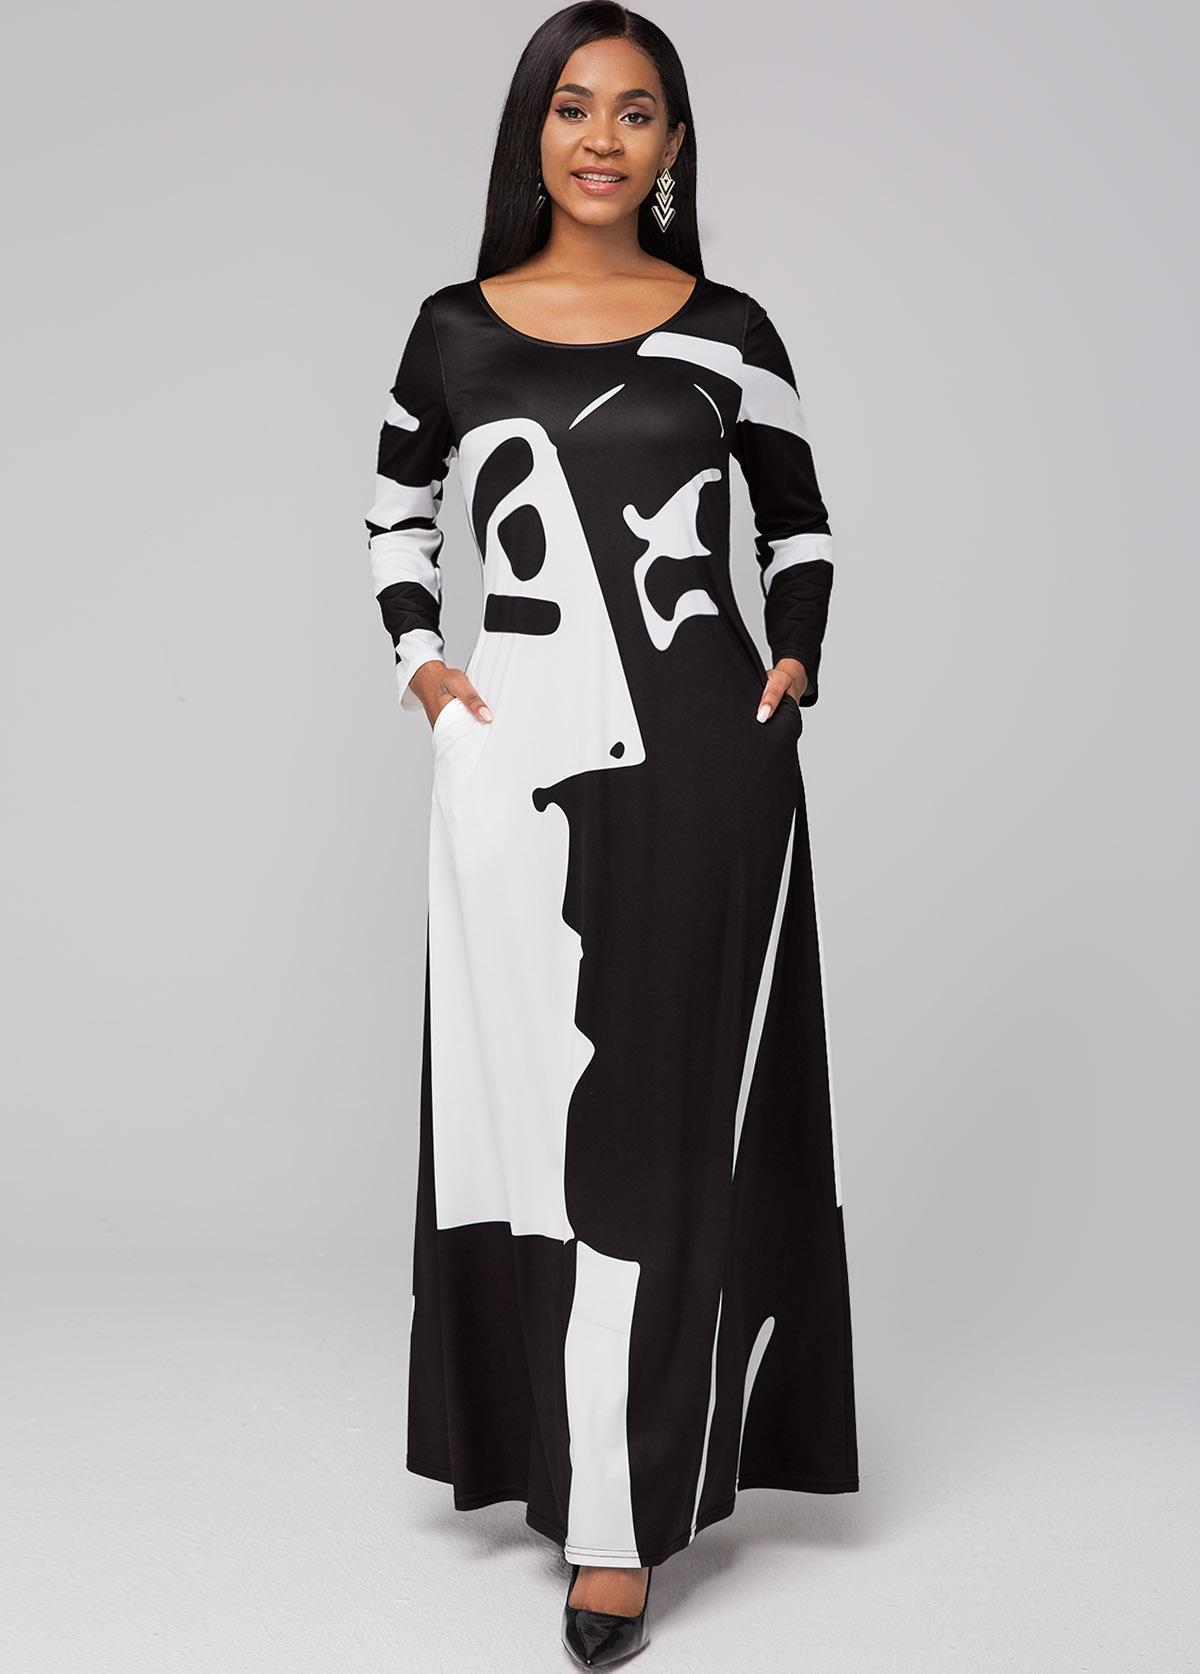 Graffiti Print Round Neck Pocket Maxi Dress